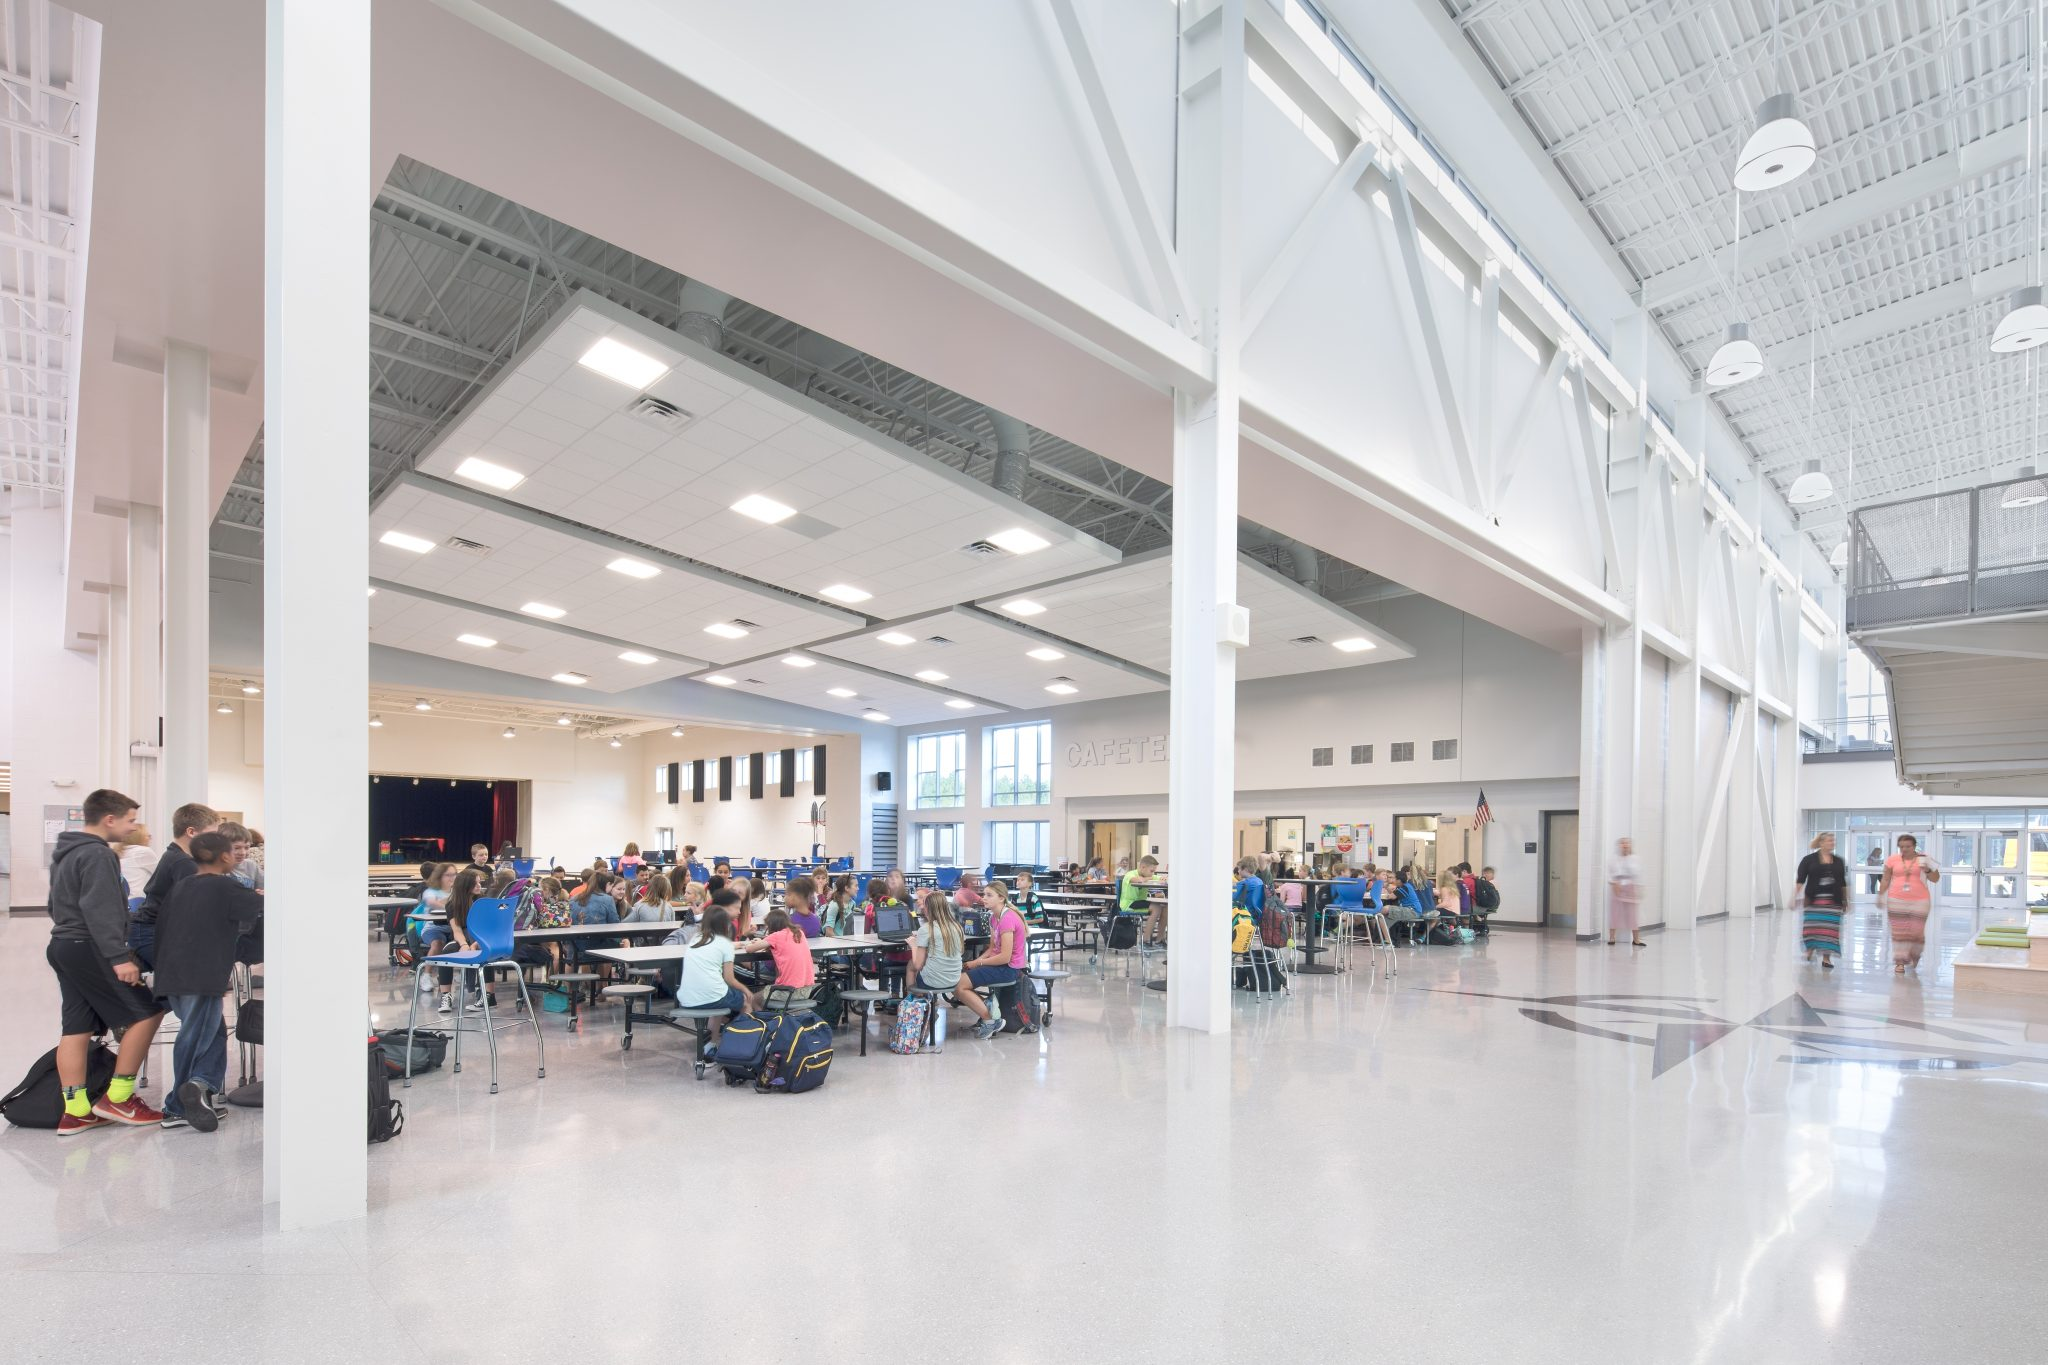 Ceiling Light Fixtures Led